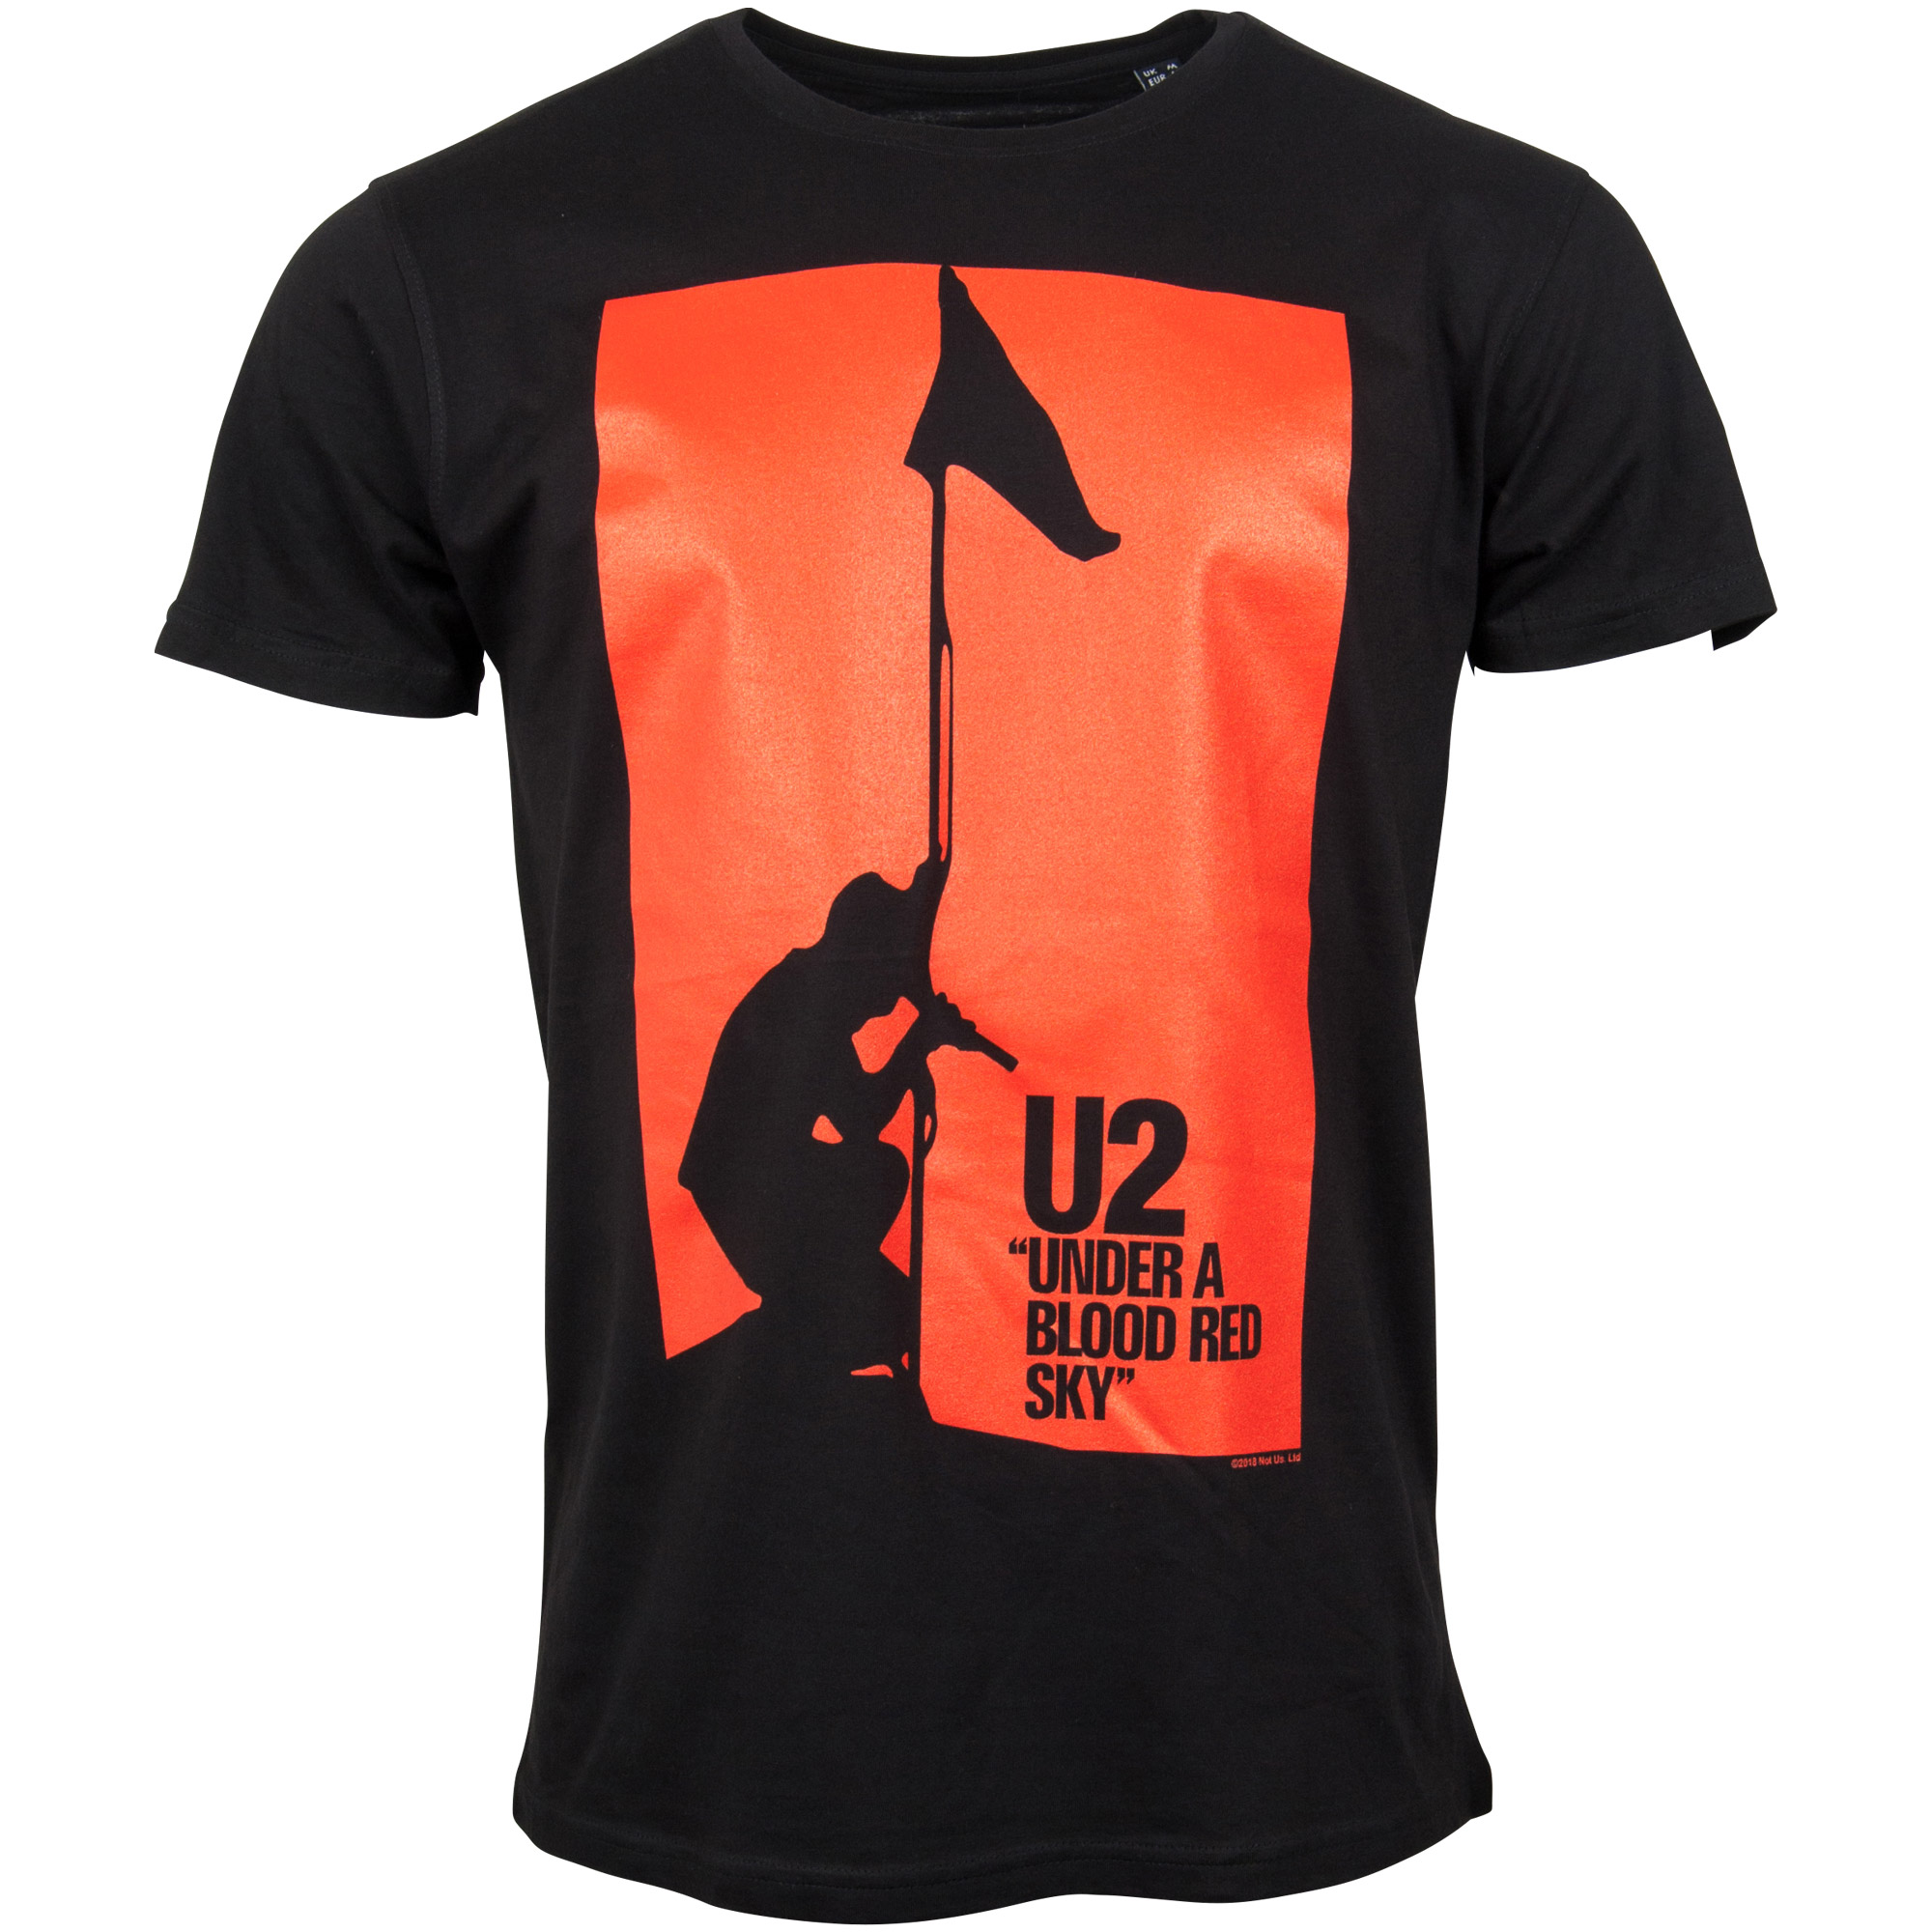 U2 - T-Shirt Blood Red Sky - schwarz